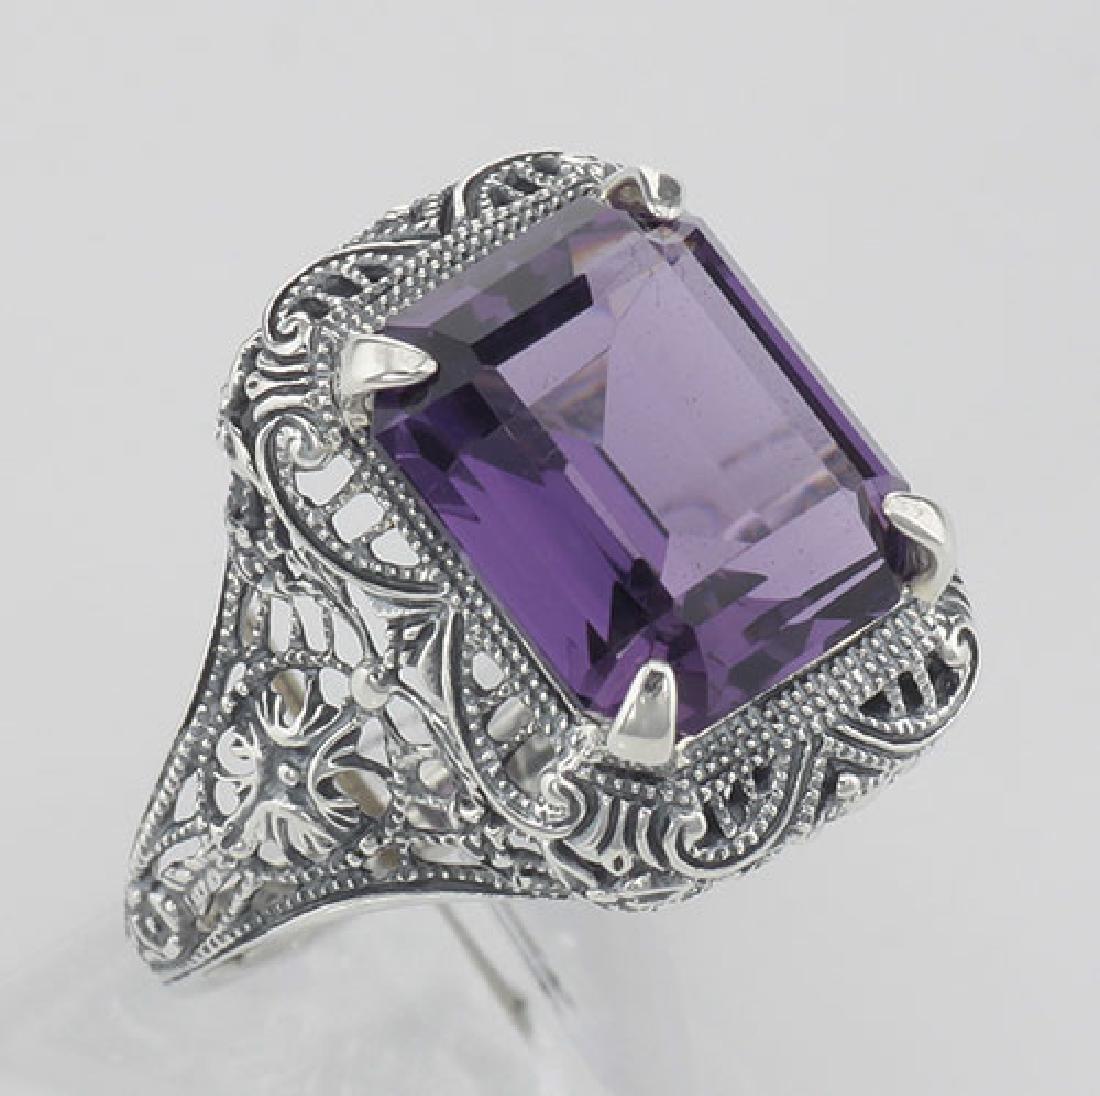 Art Deco Style Genuine Emerald Cut Amethyst Ring - Ster